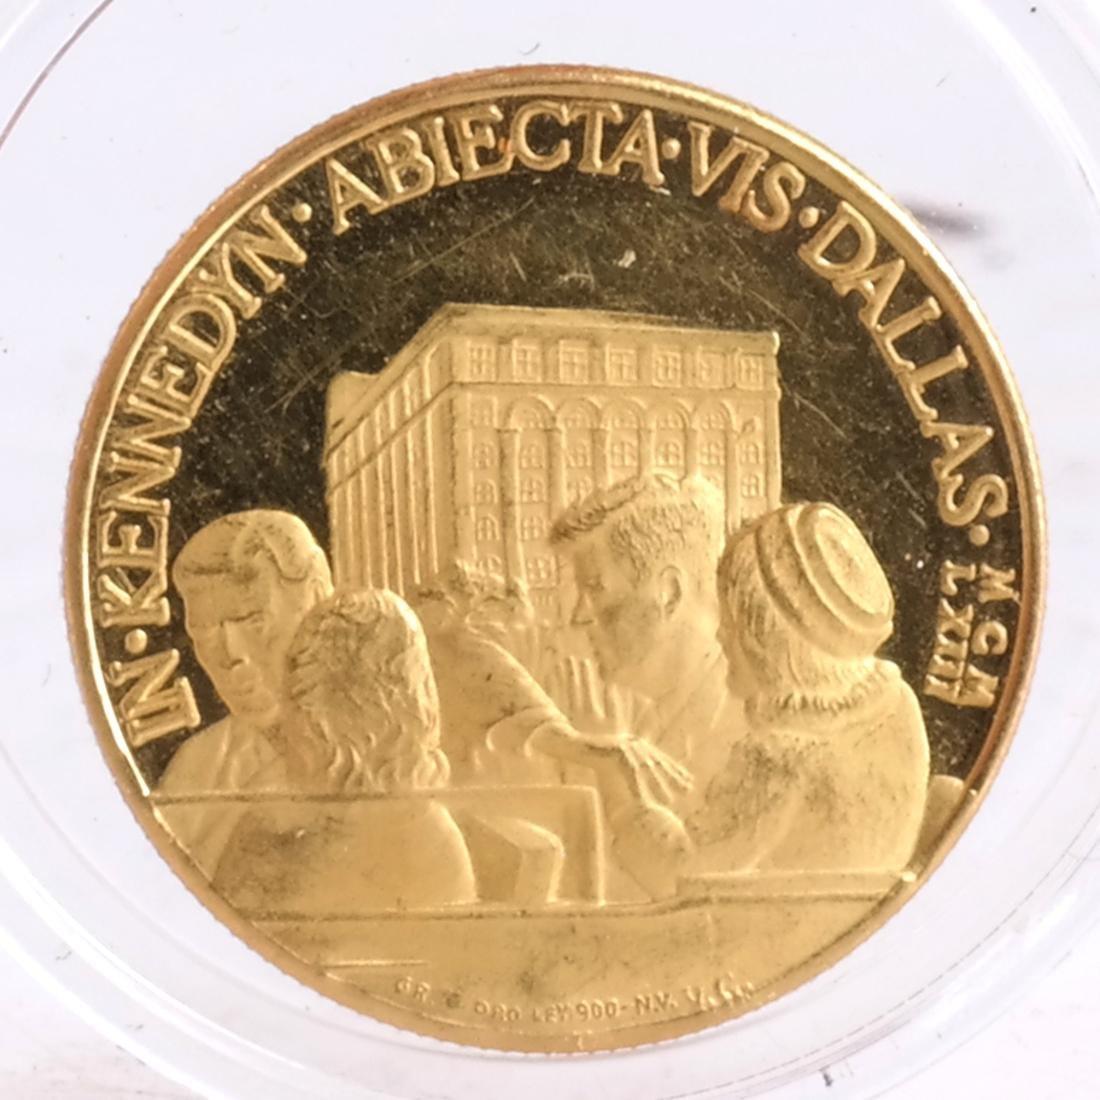 1999 Gold Eagle, Bicentennial, Kennedy - 5